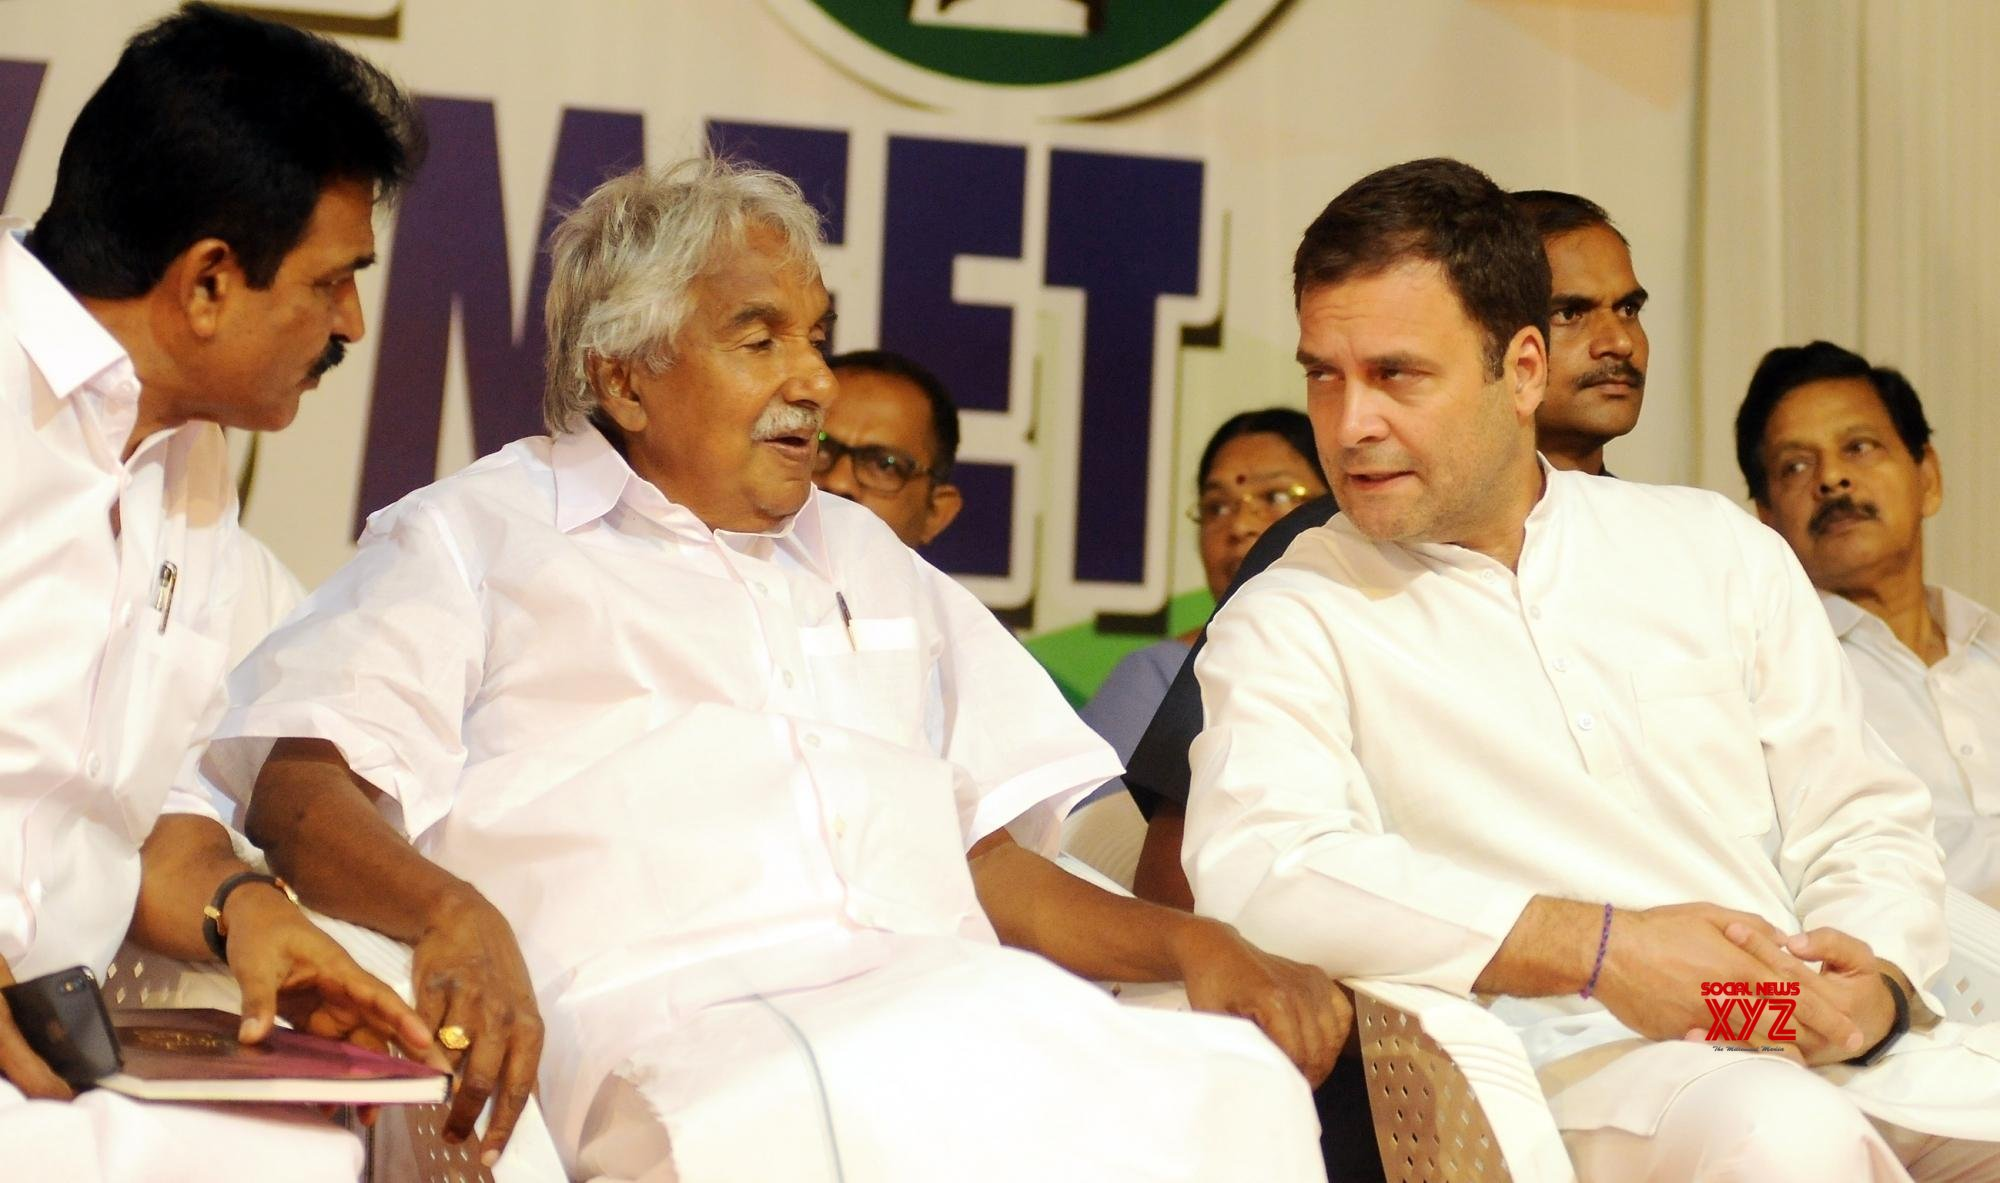 Kannur: Rahul Gandhi at a coordination meeting in Kerala (Batch - 2) #Gallery